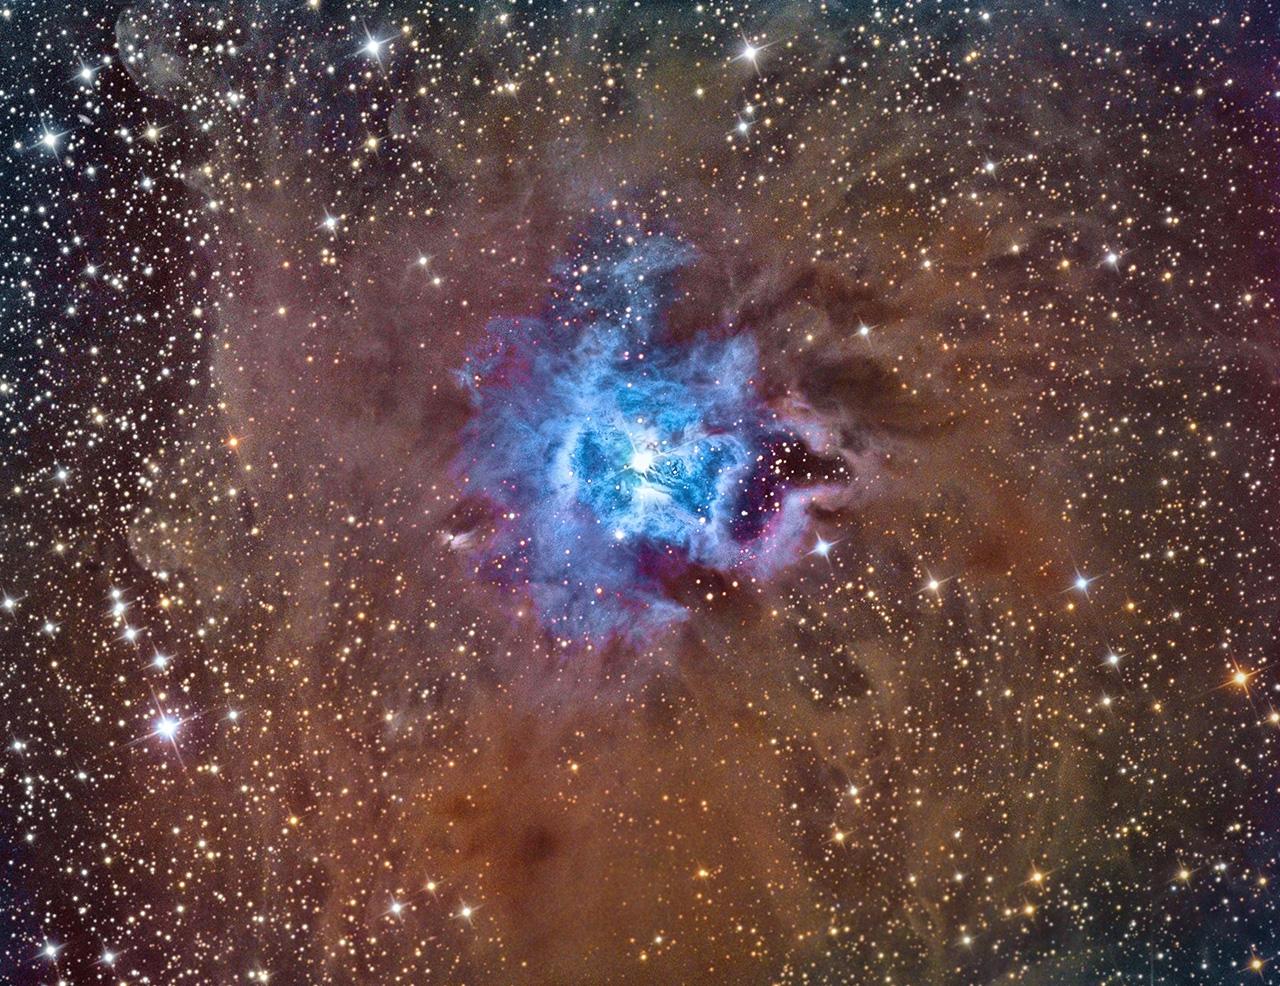 NGC7023s